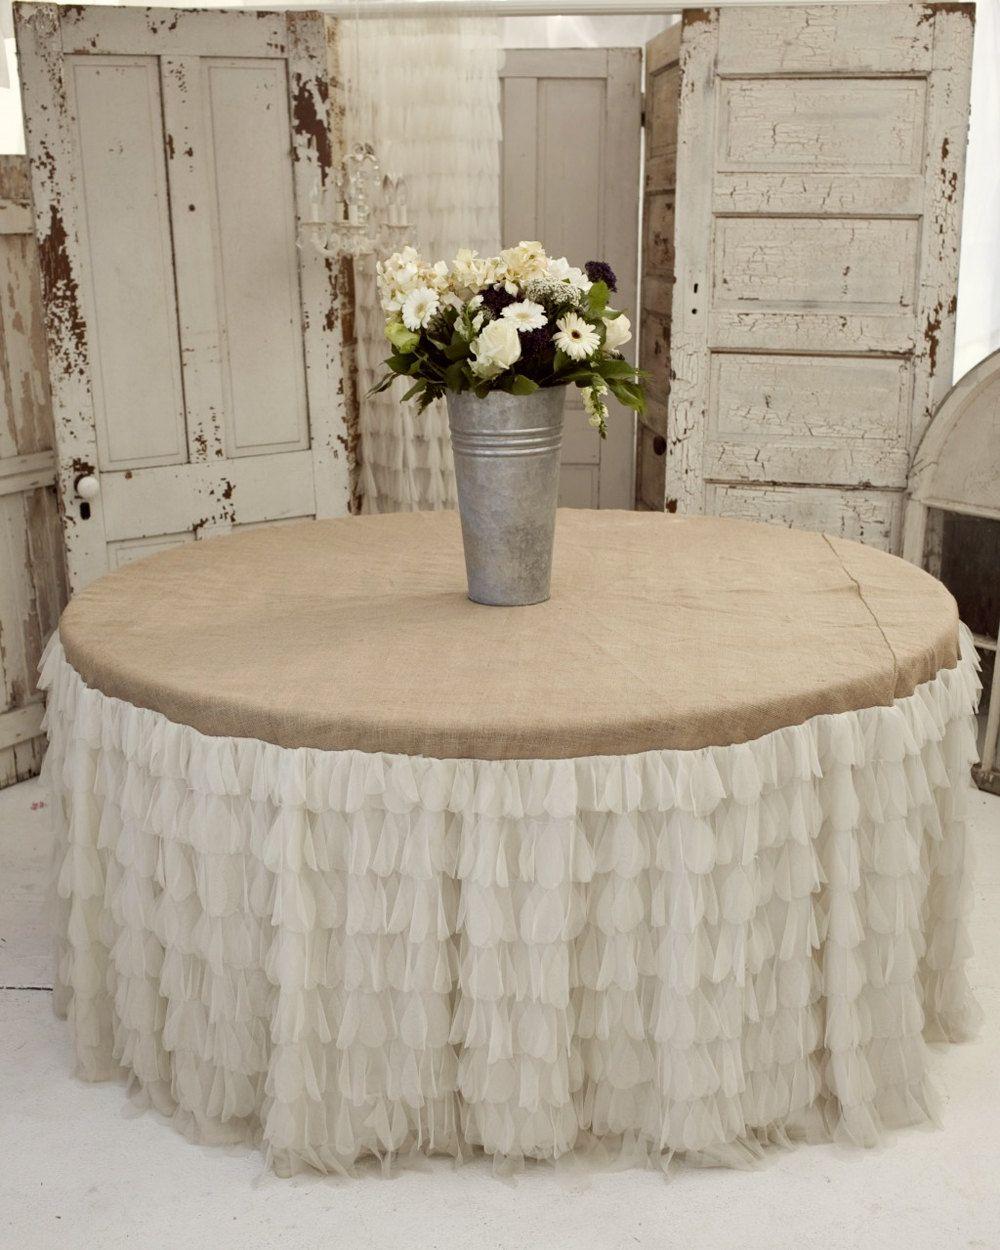 Amazing Large Ivory Petals And Burlap Tablecloth   Vintage Weddings. $496.00, Via  Etsy.